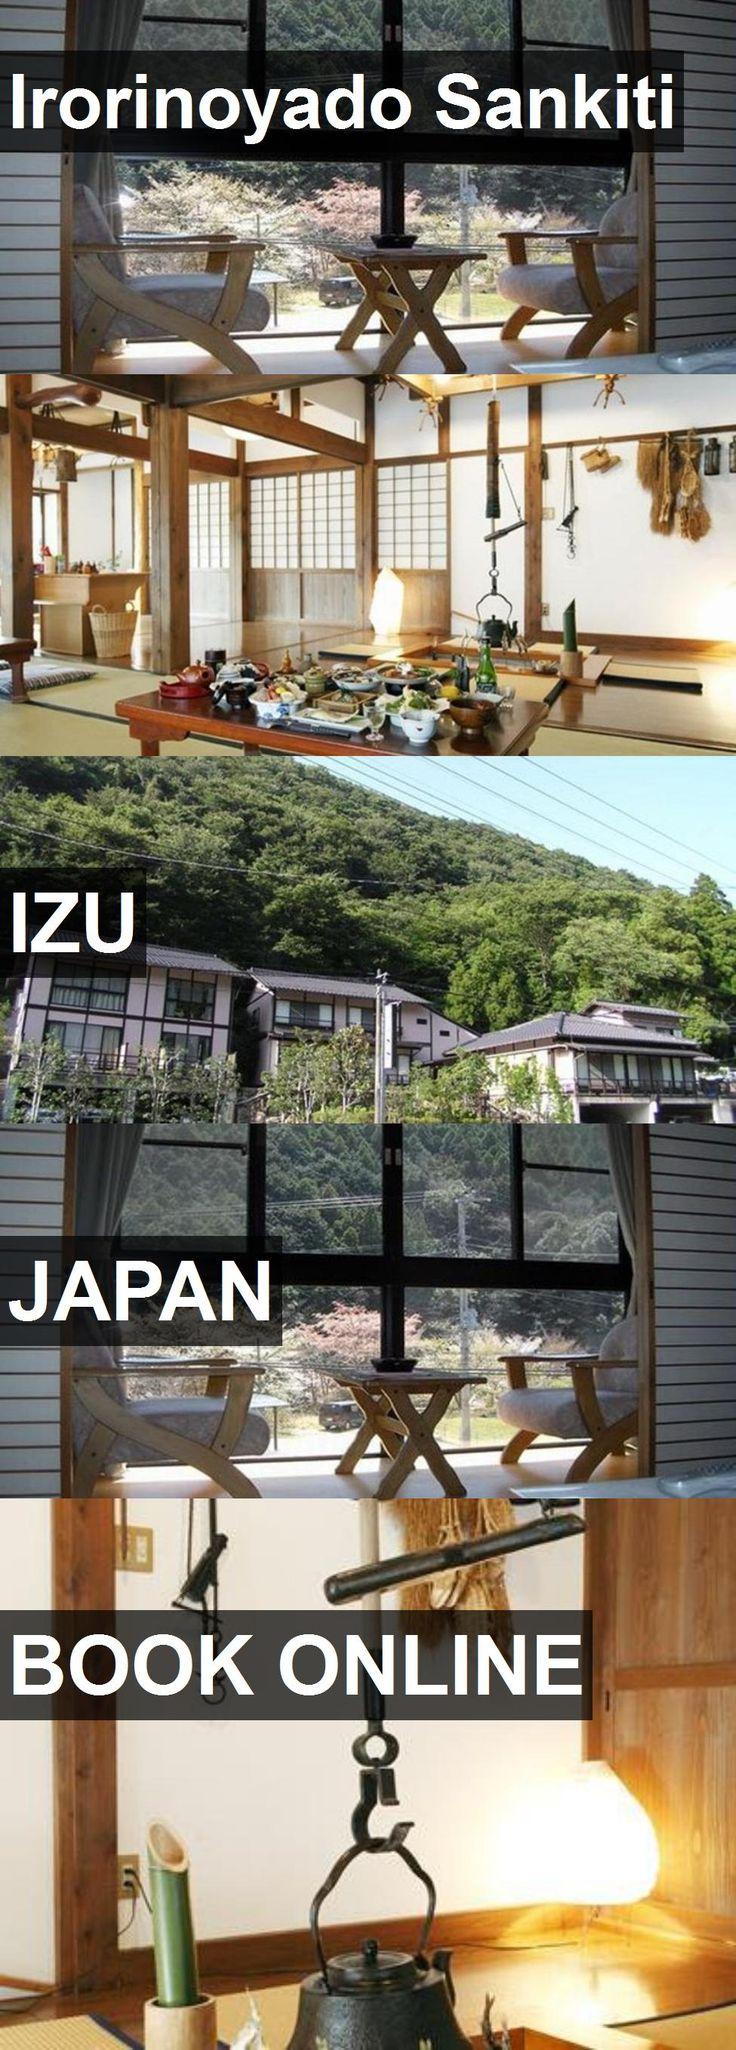 Hotel Irorinoyado Sankiti in Izu, Japan. For more information, photos, reviews and best prices please follow the link. #Japan #Izu #travel #vacation #hotel